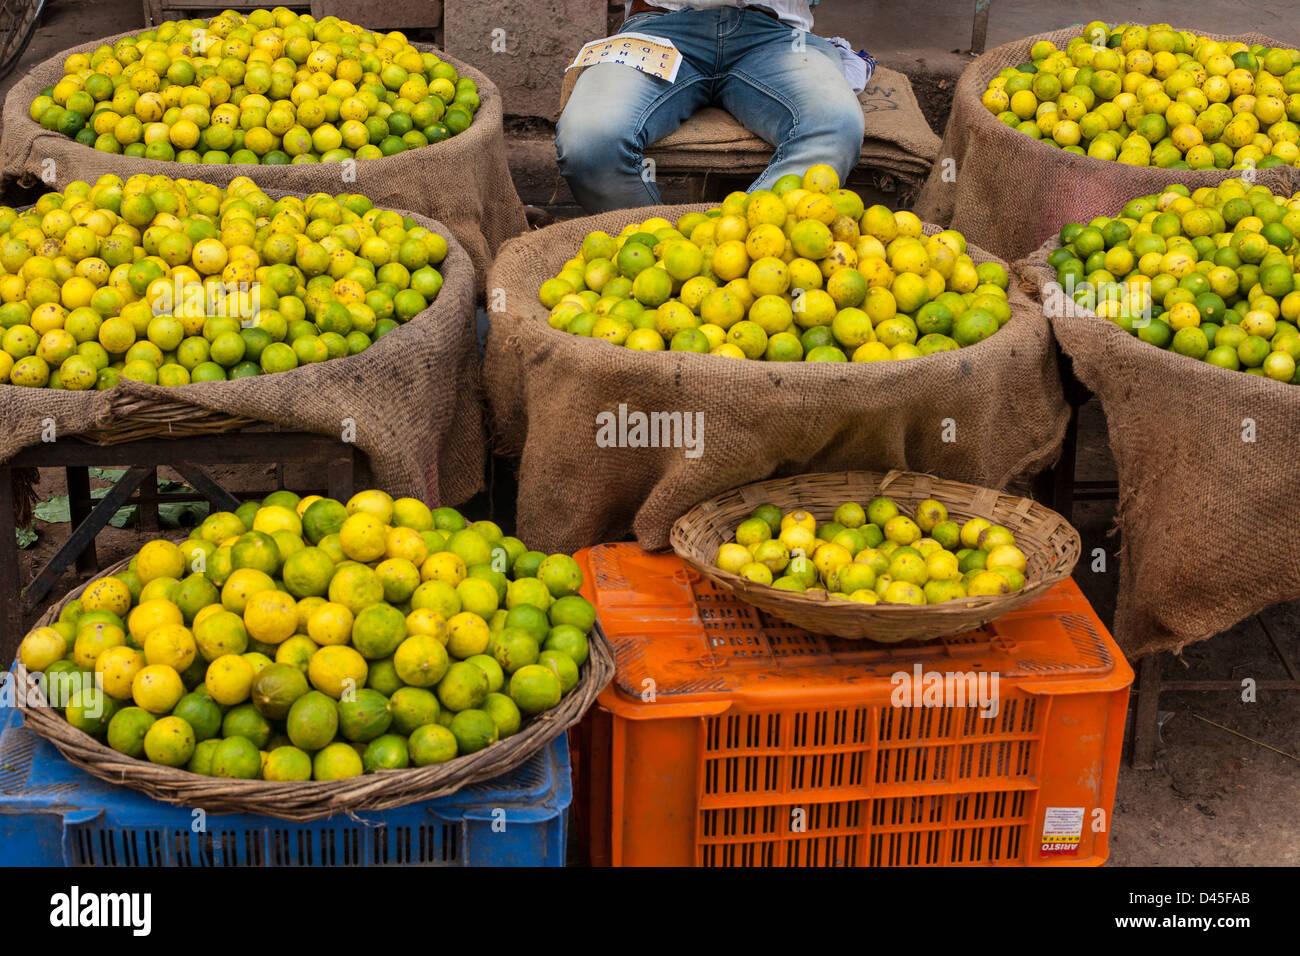 lemons at an fruit market, Varanasi, India - Stock Image